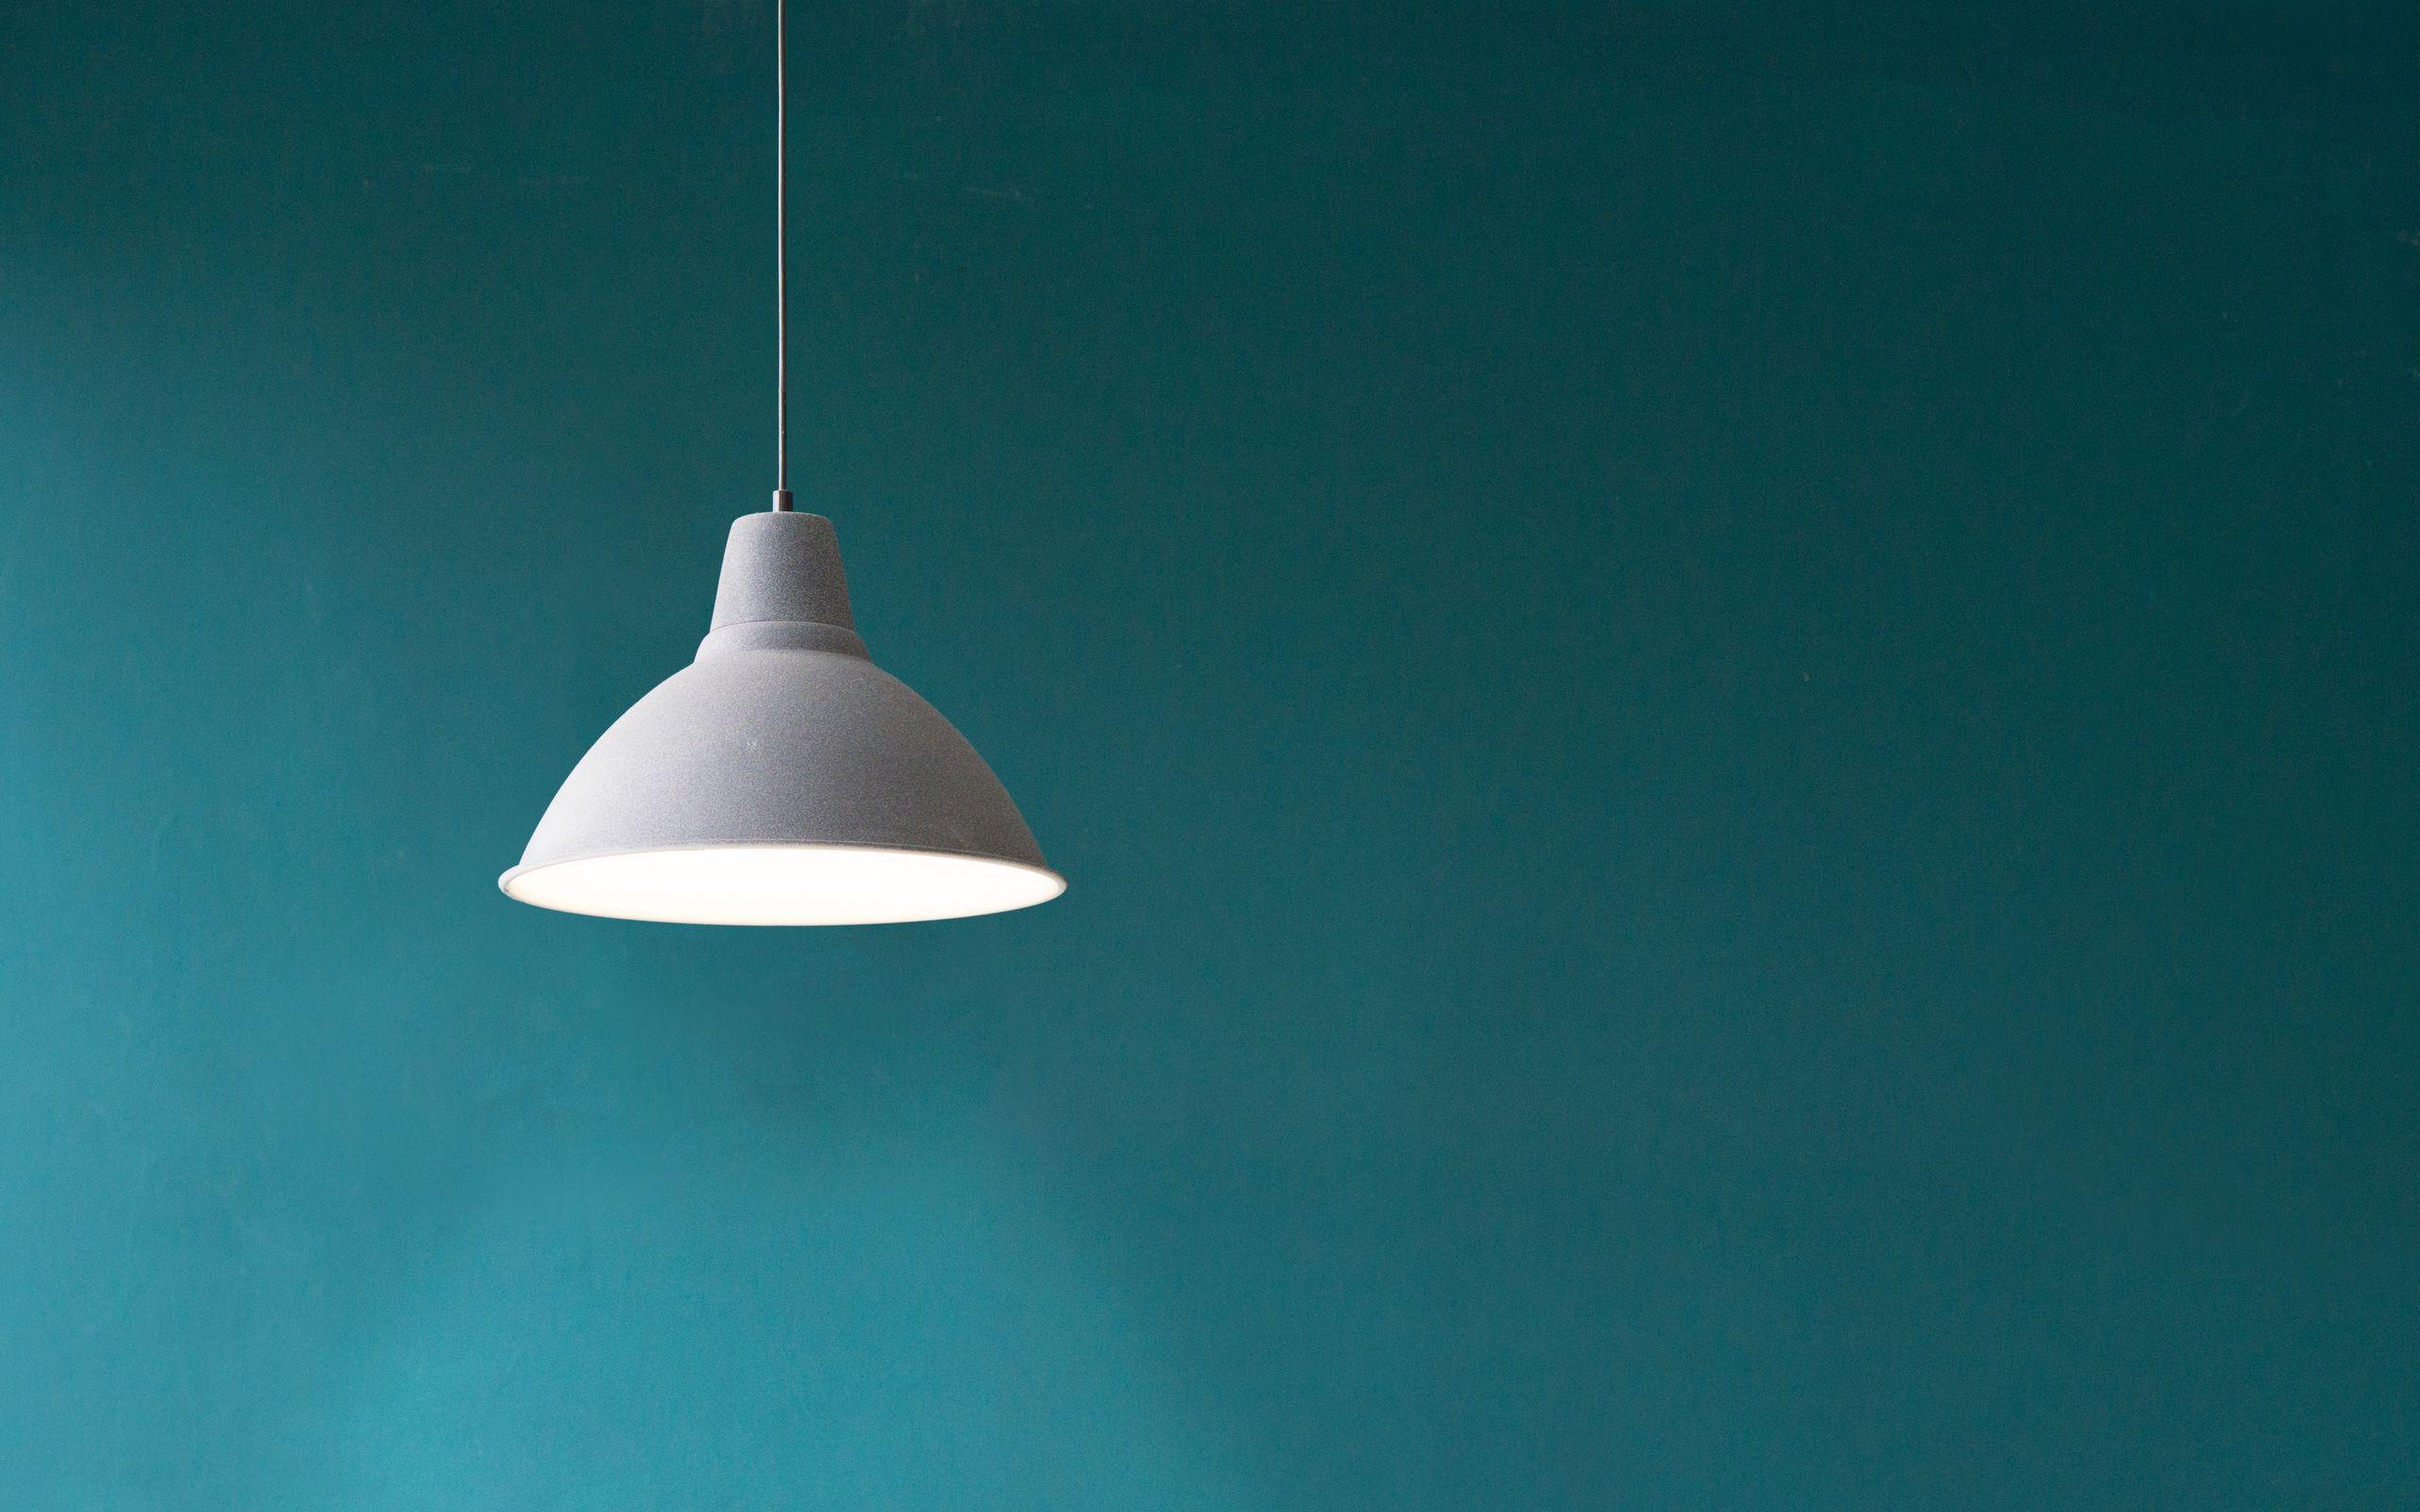 2560x1600 Wallpaper lamp, electricity, minimalism, wall